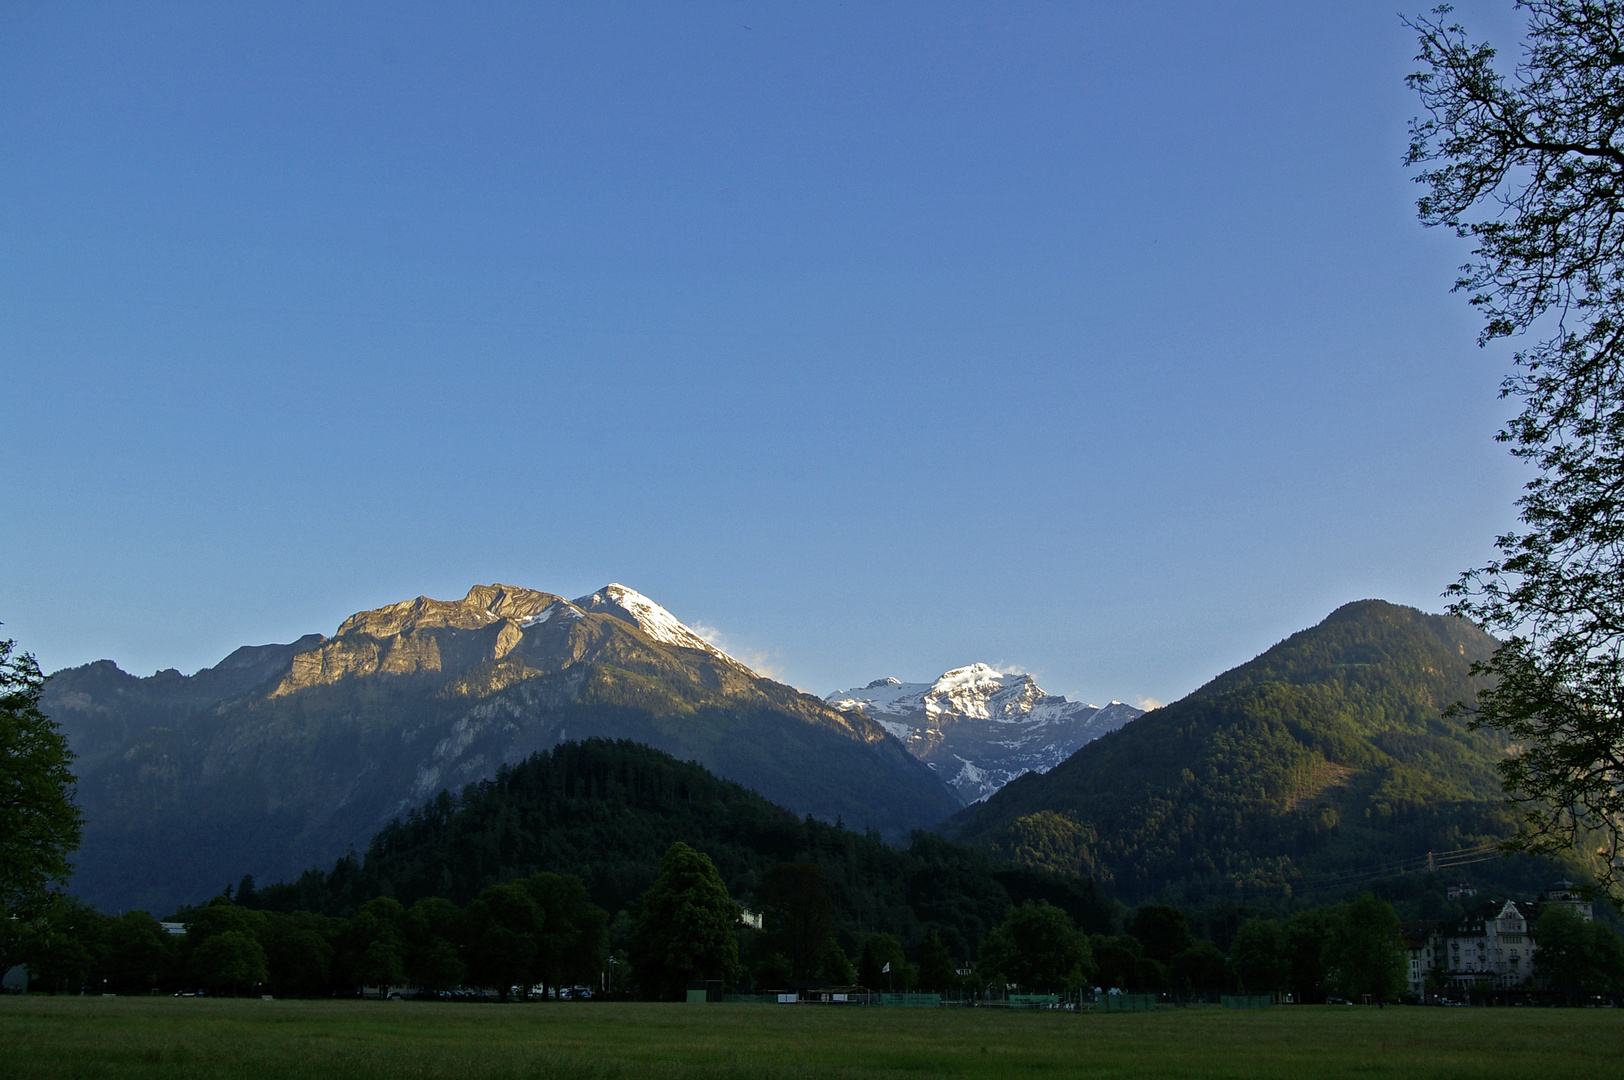 Alpenglühen, Junfraujoch in der Abendsonne